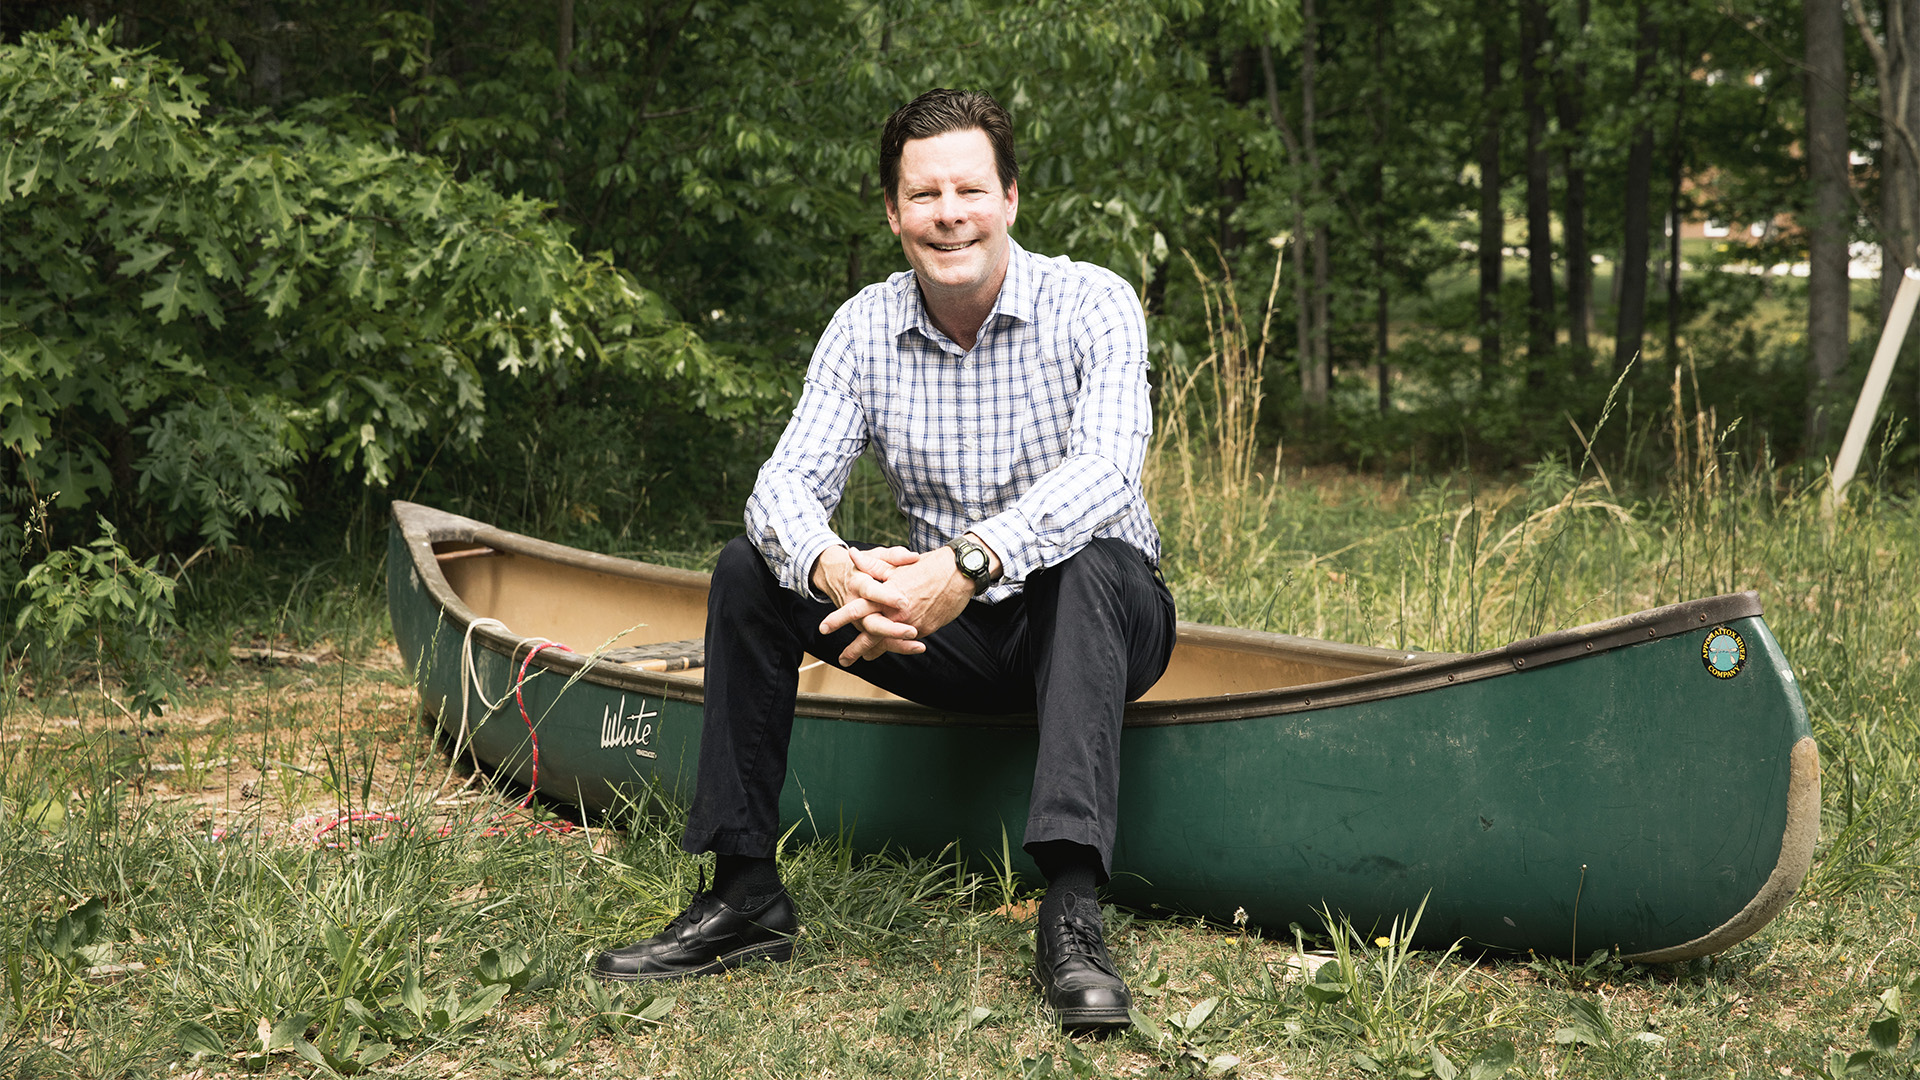 Scott Schomlesky, Hampden-Sydney's Director of High Adventure